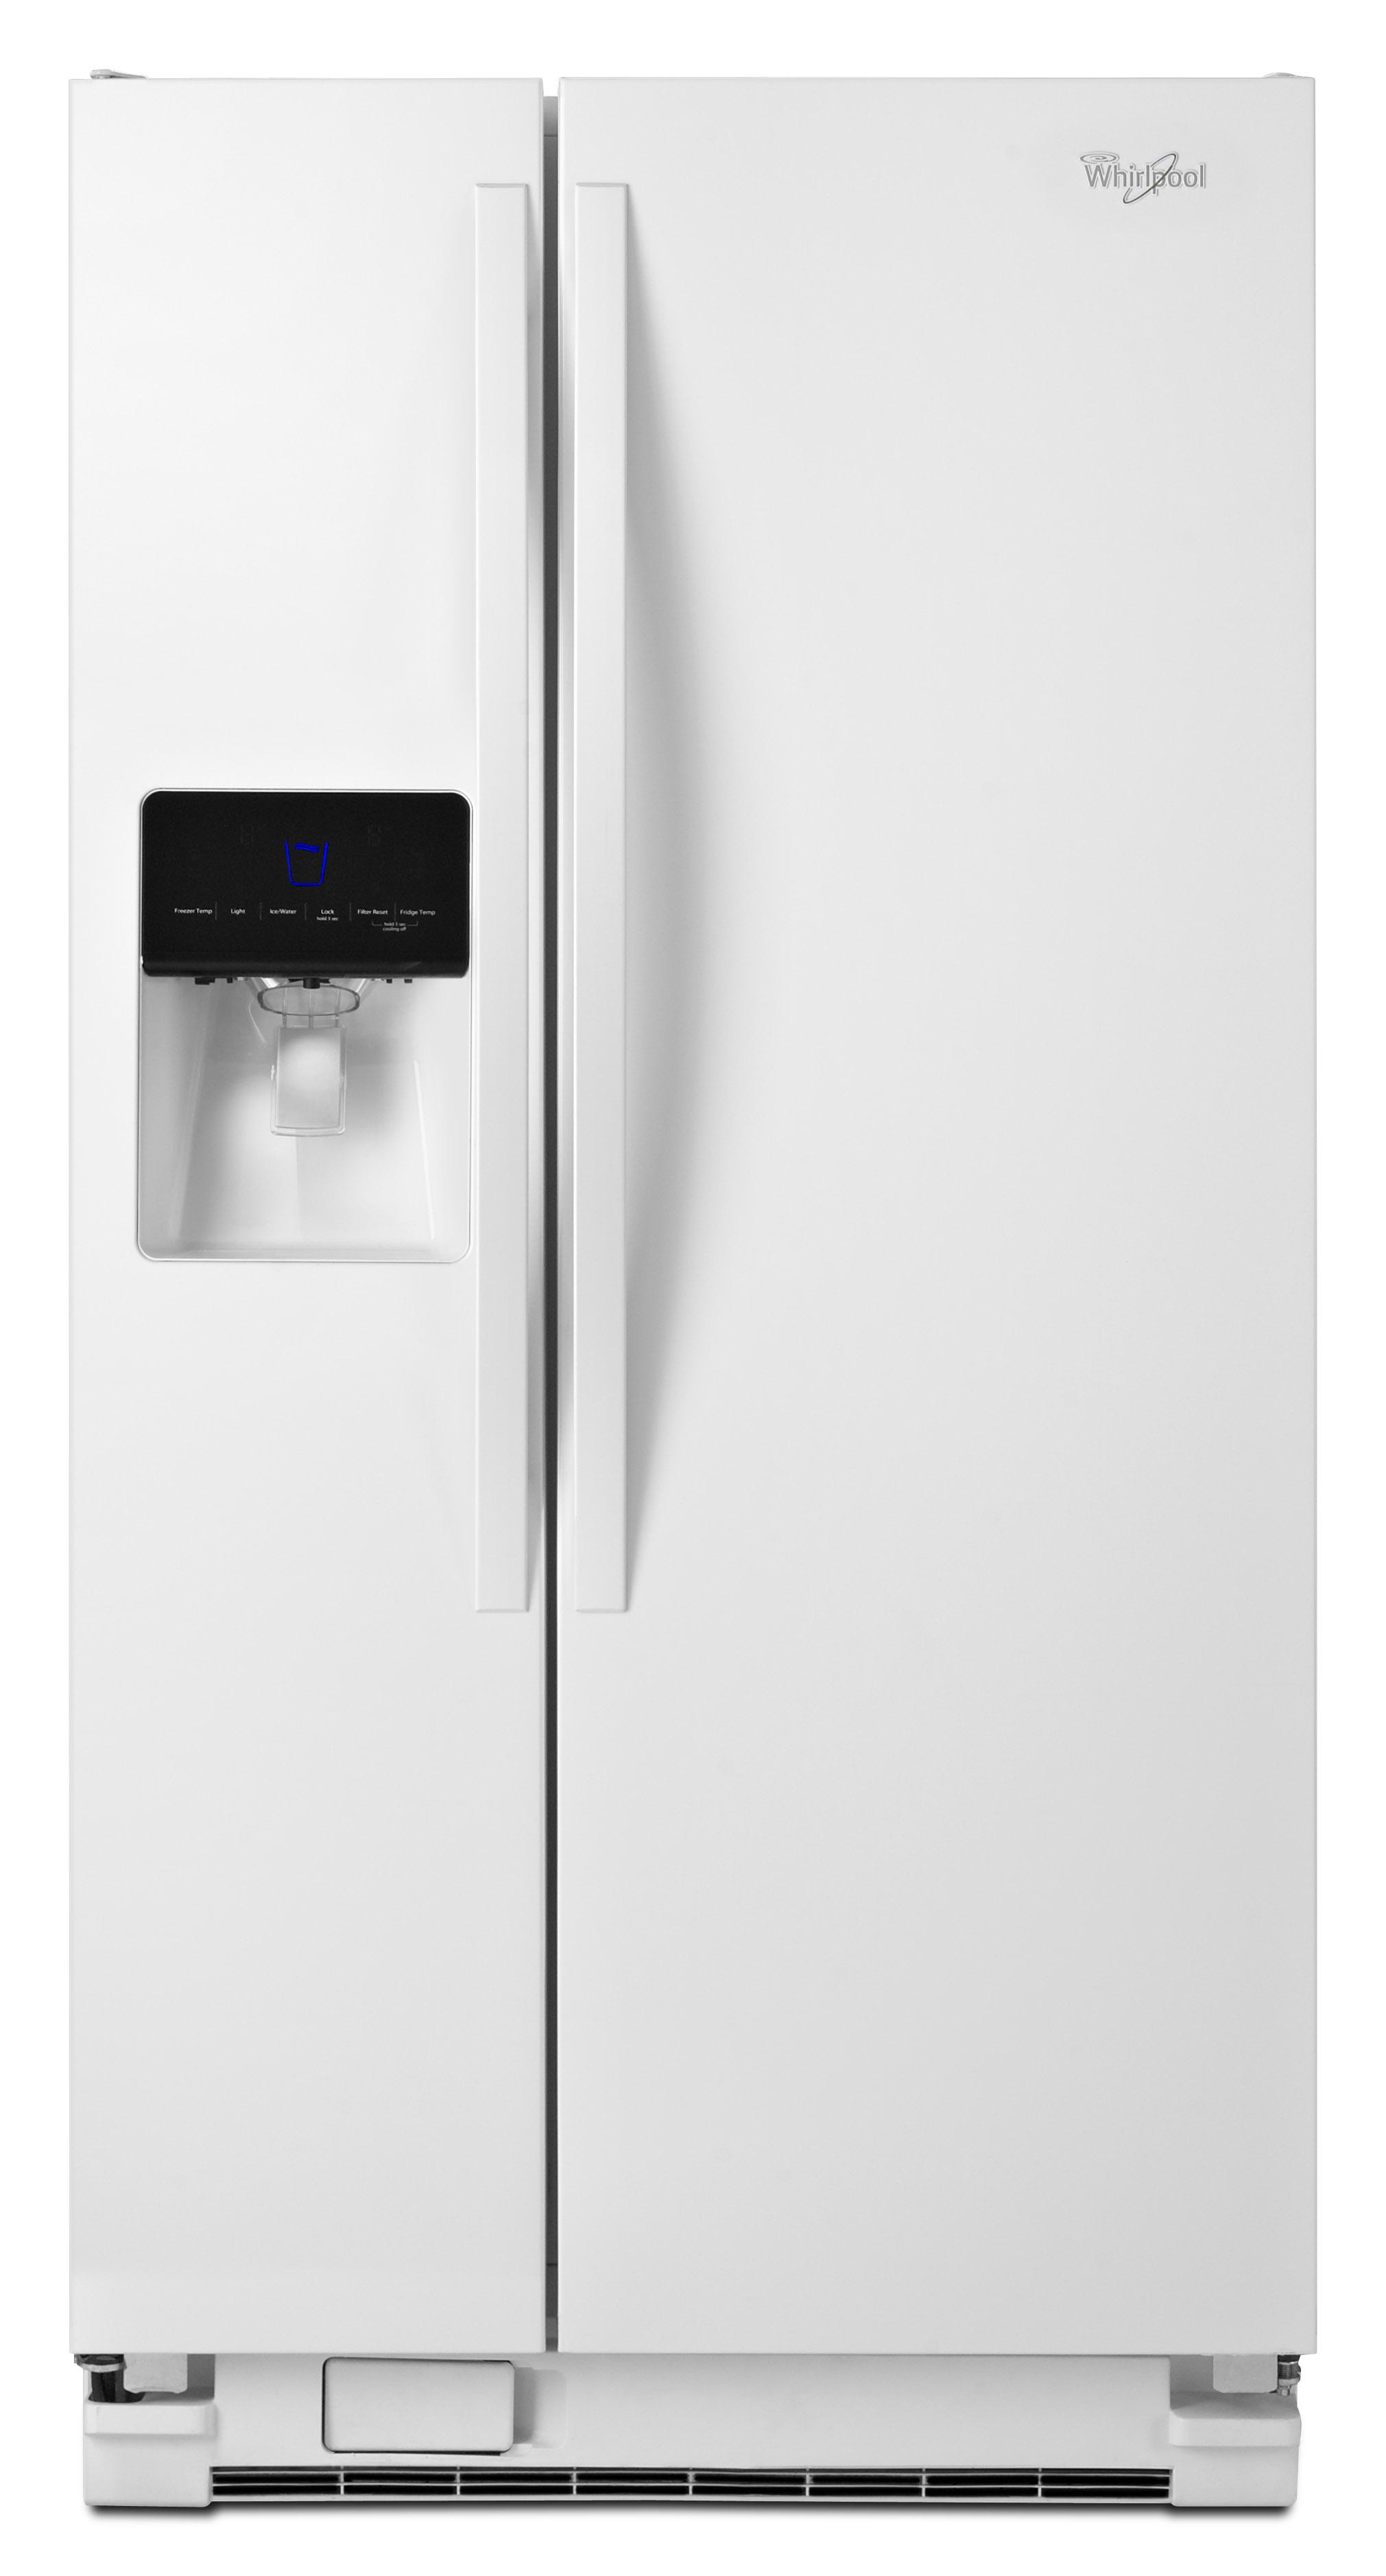 Whirlpool WRS342FIAW 21.3 cu. ft.- Side-by-Side Refrigerator - White